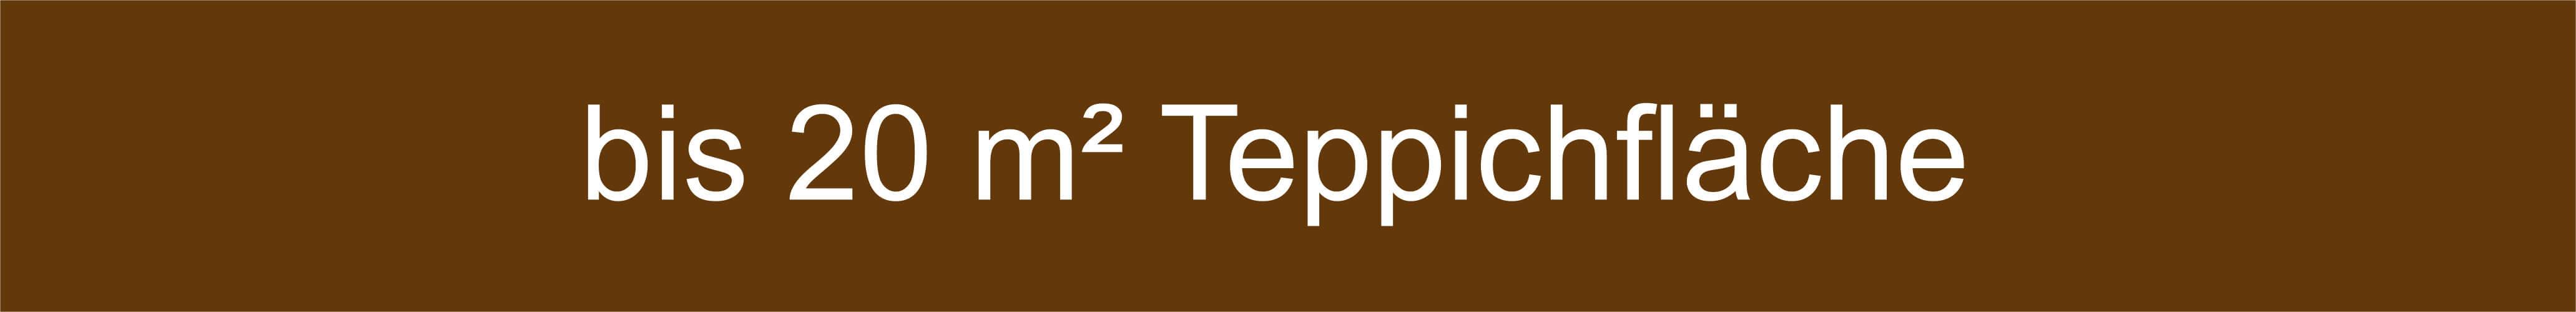 Mengenempfehlung Teppiche bis 20 Quadratmeter